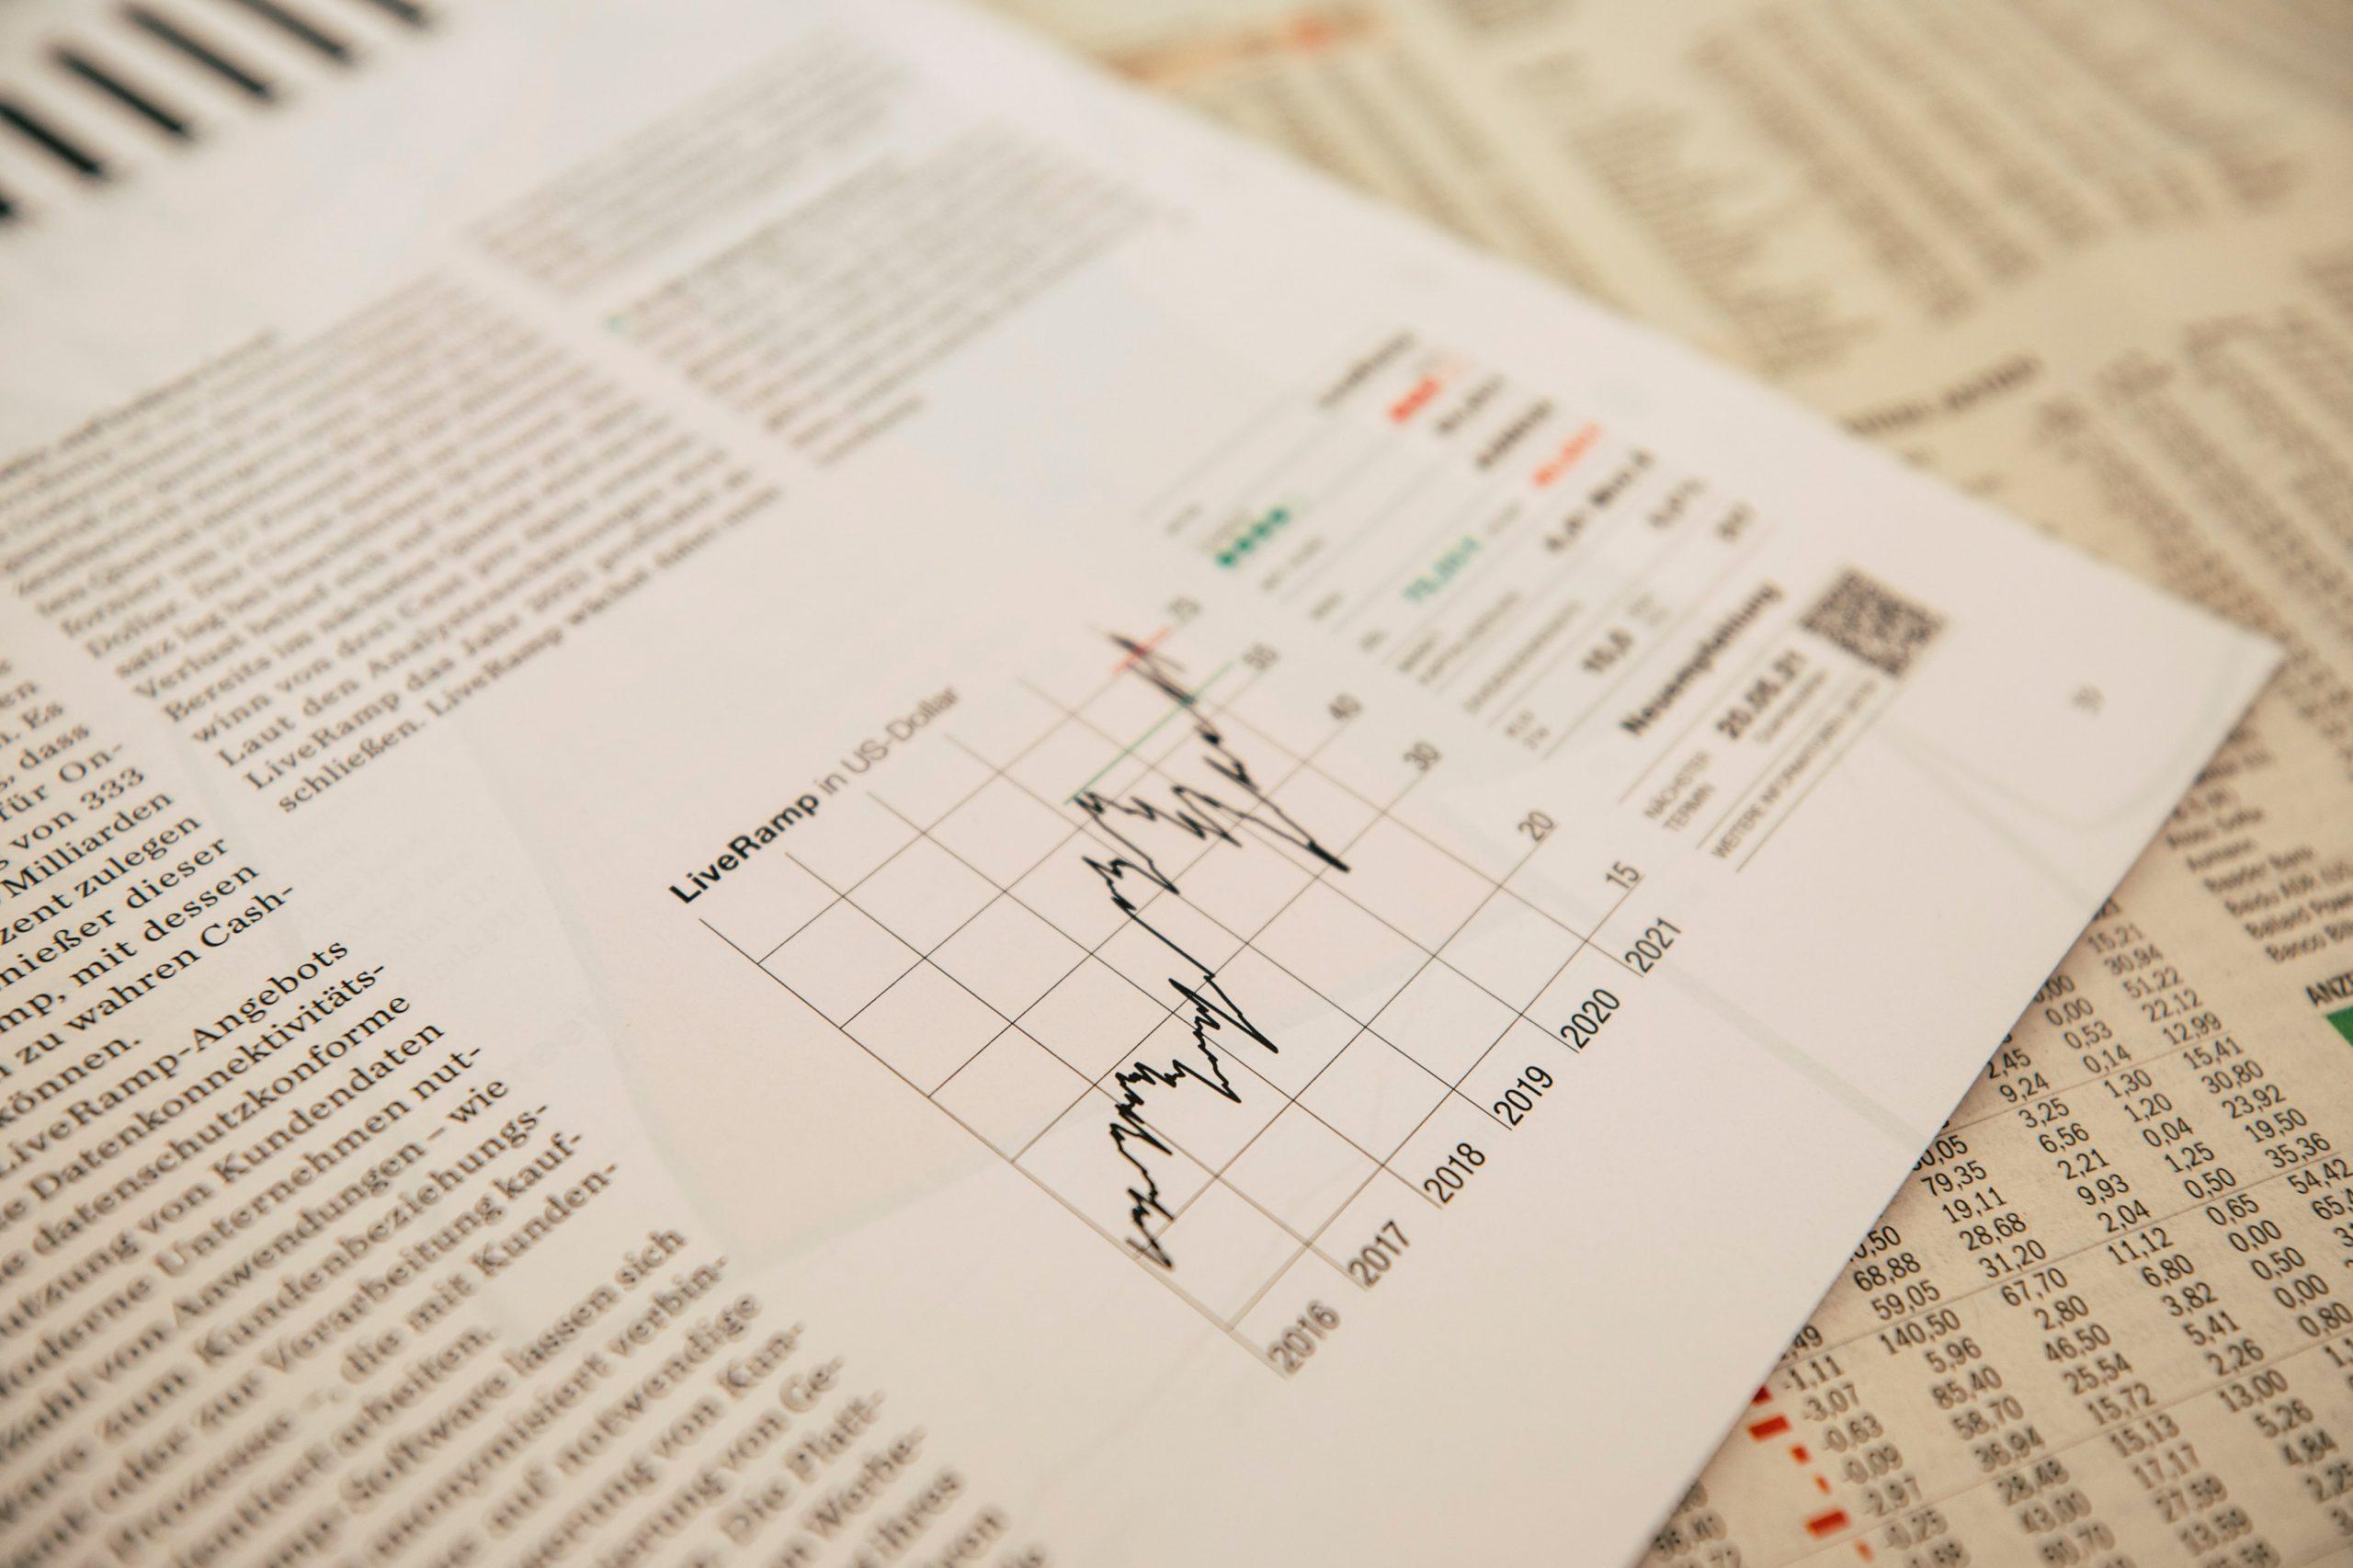 3 акции Dow Jones для покупки сейчас